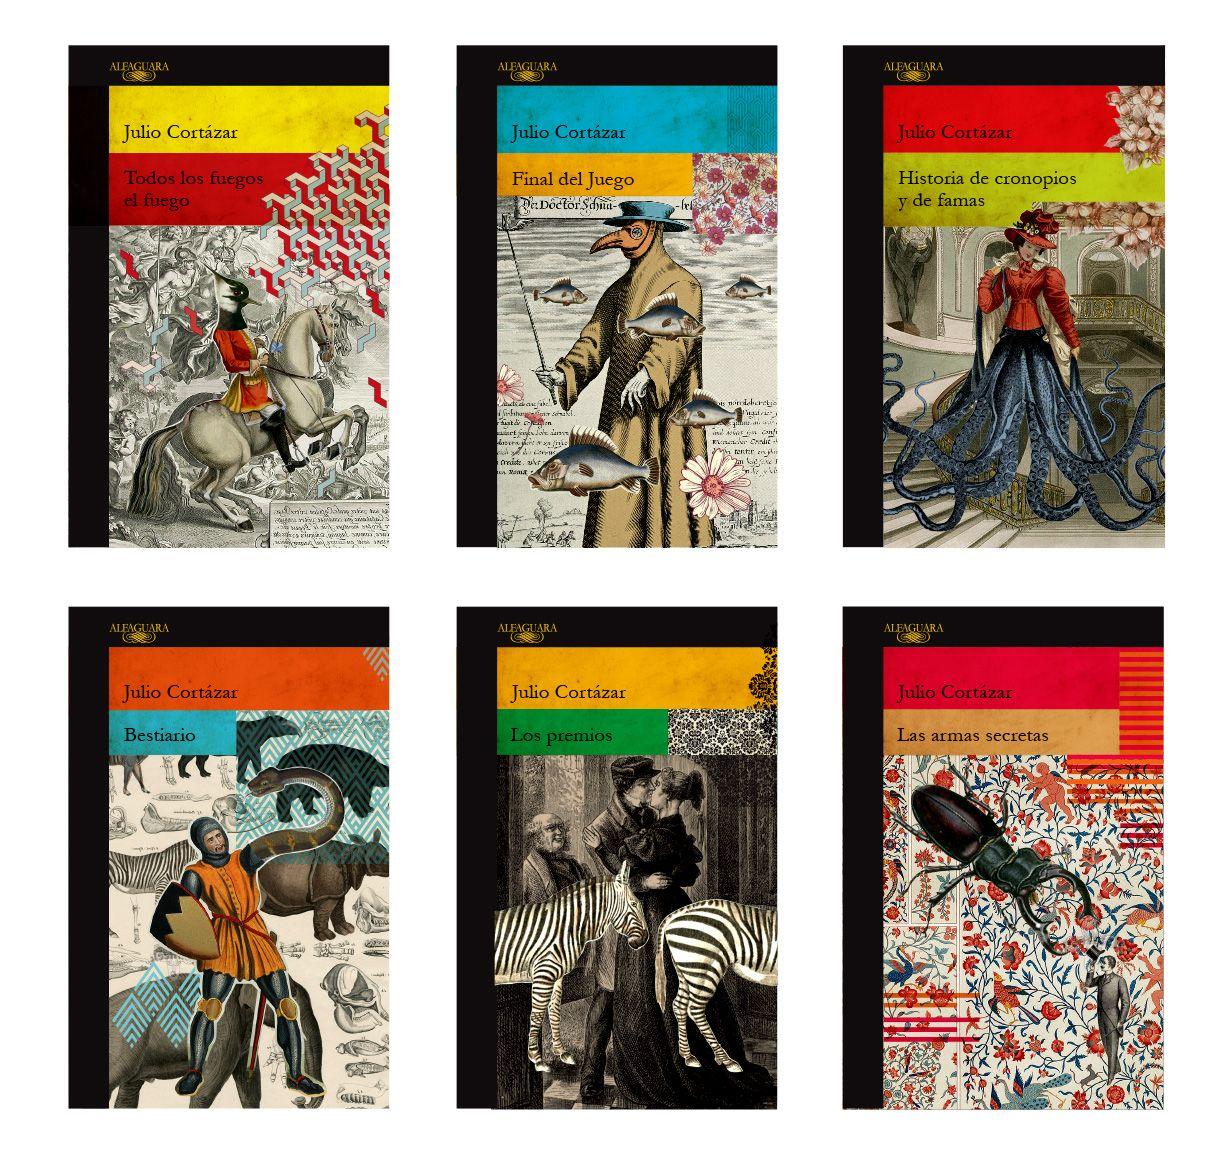 Penguin Random House Book Cover Competition : Book cover collection julio cortazar for alfaguara